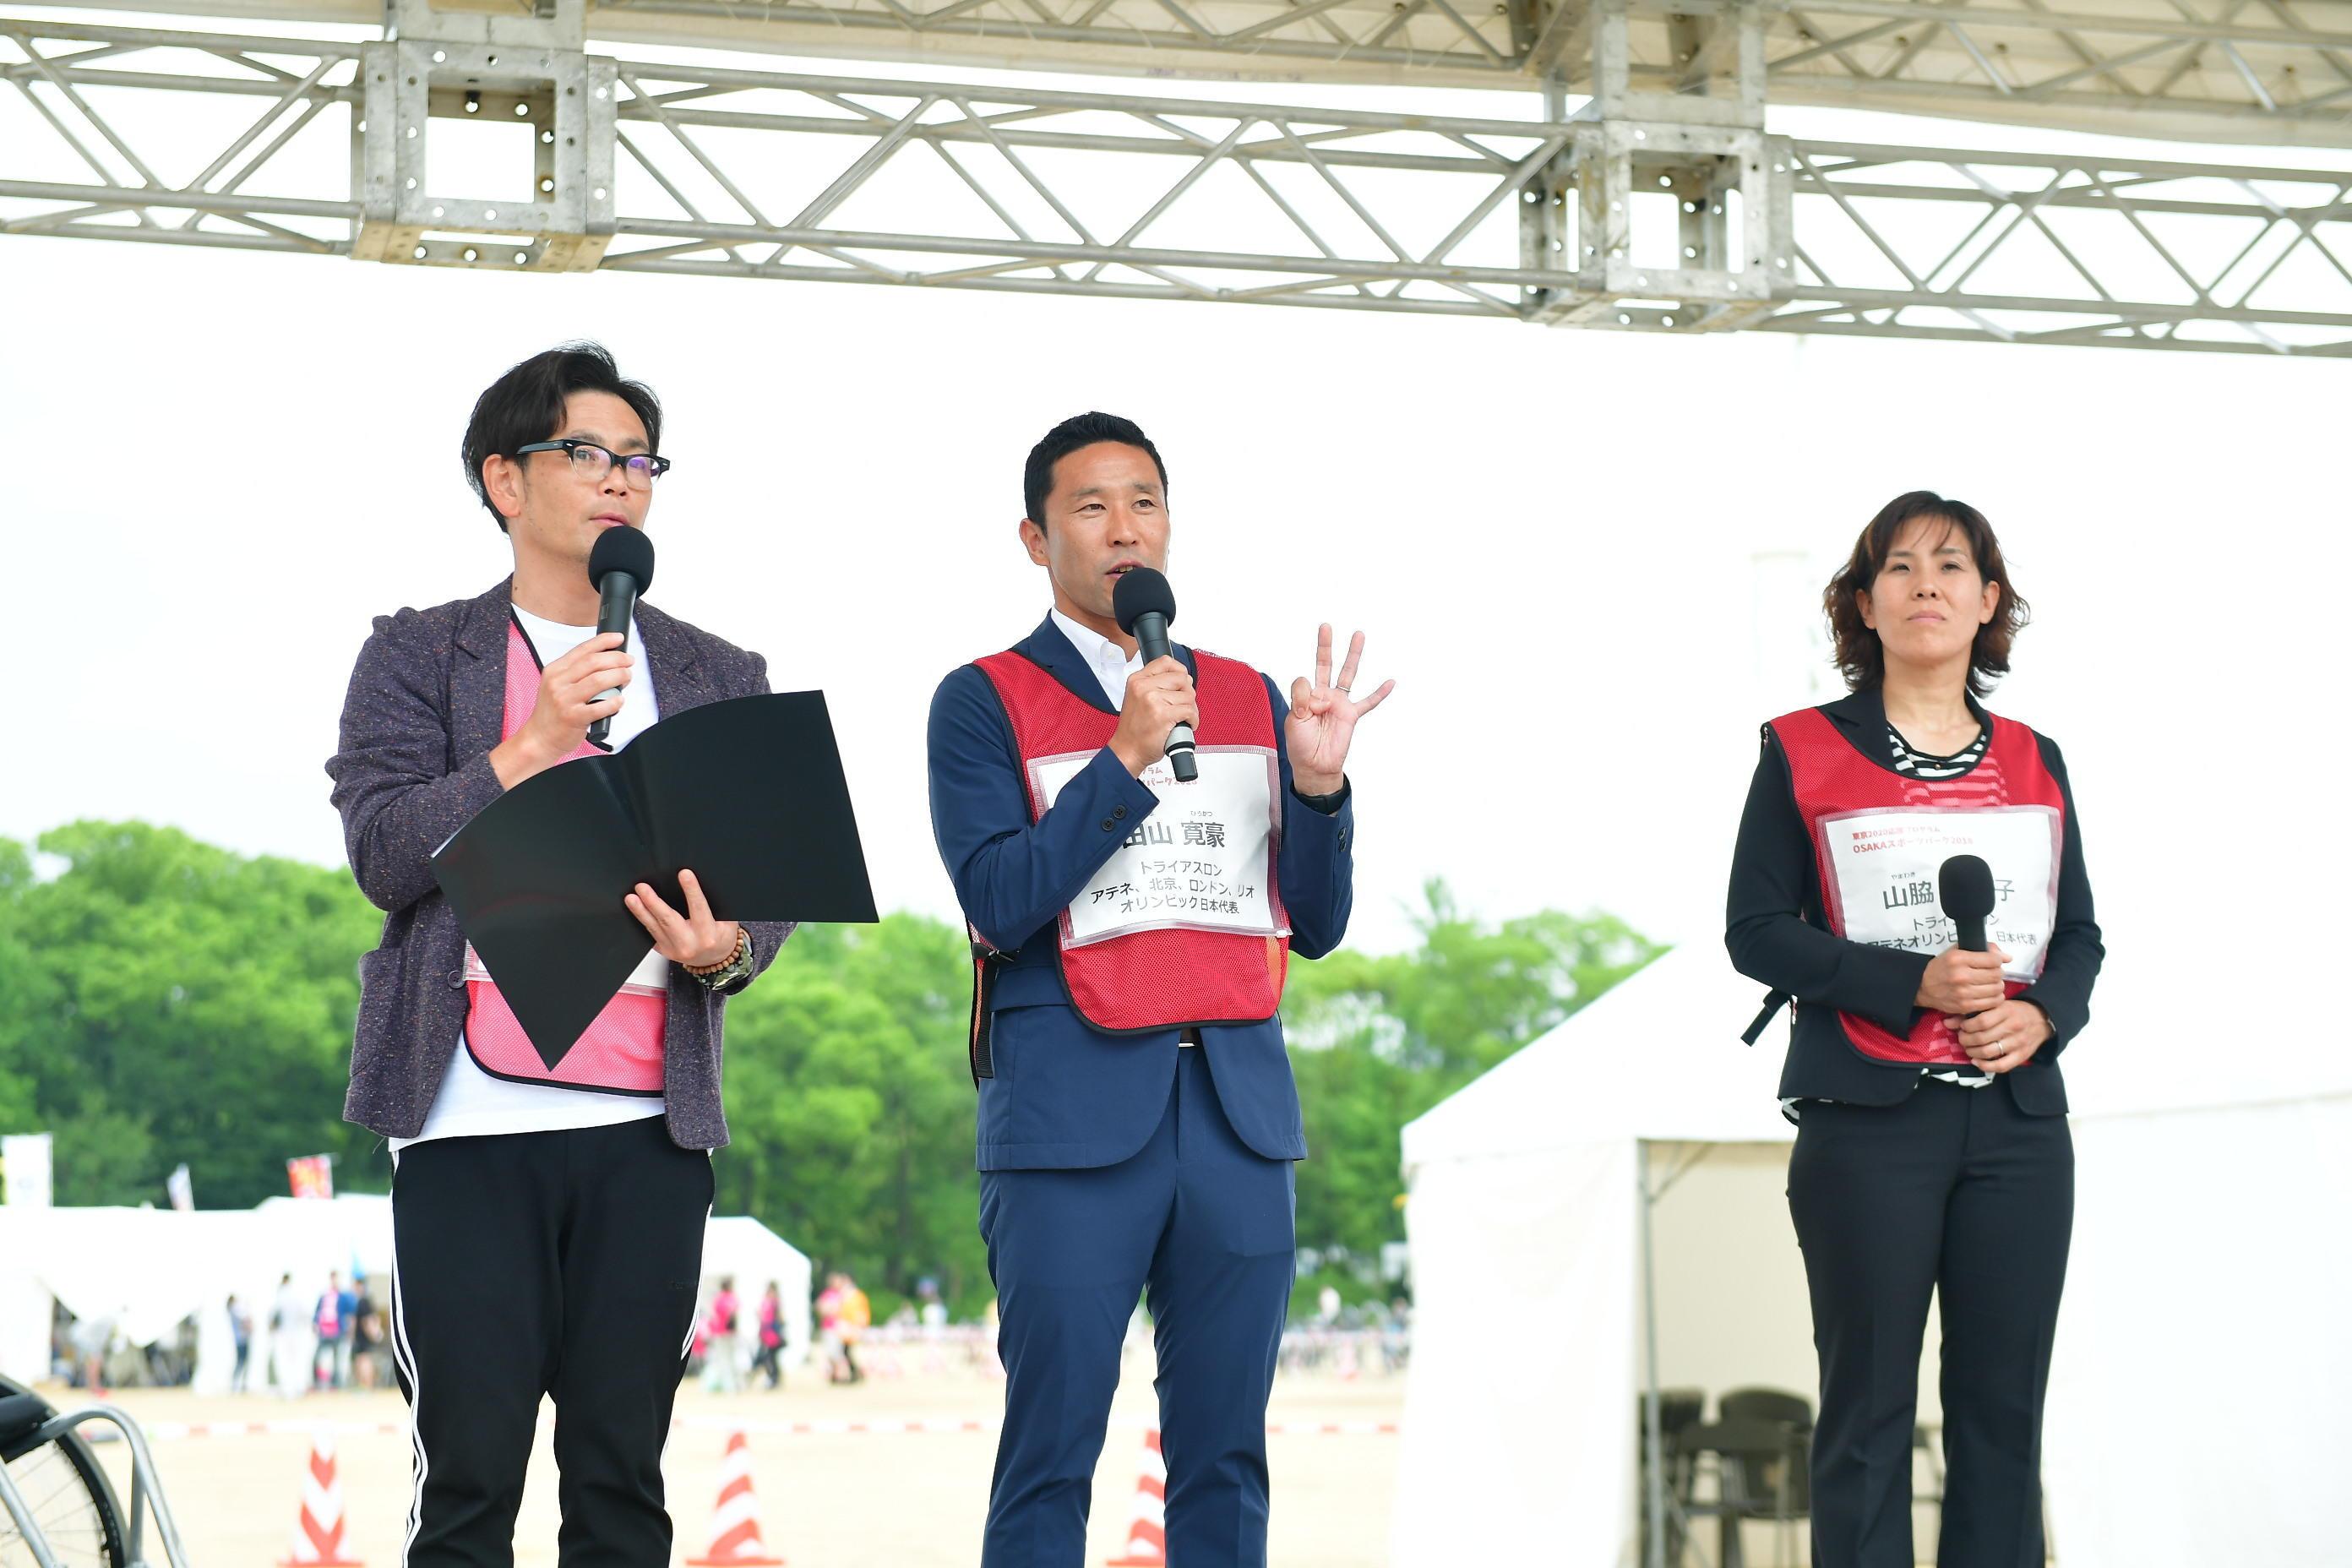 http://news.yoshimoto.co.jp/20180612160826-30d42e2659f843a2a6681bd4d530337aef4766d3.jpg